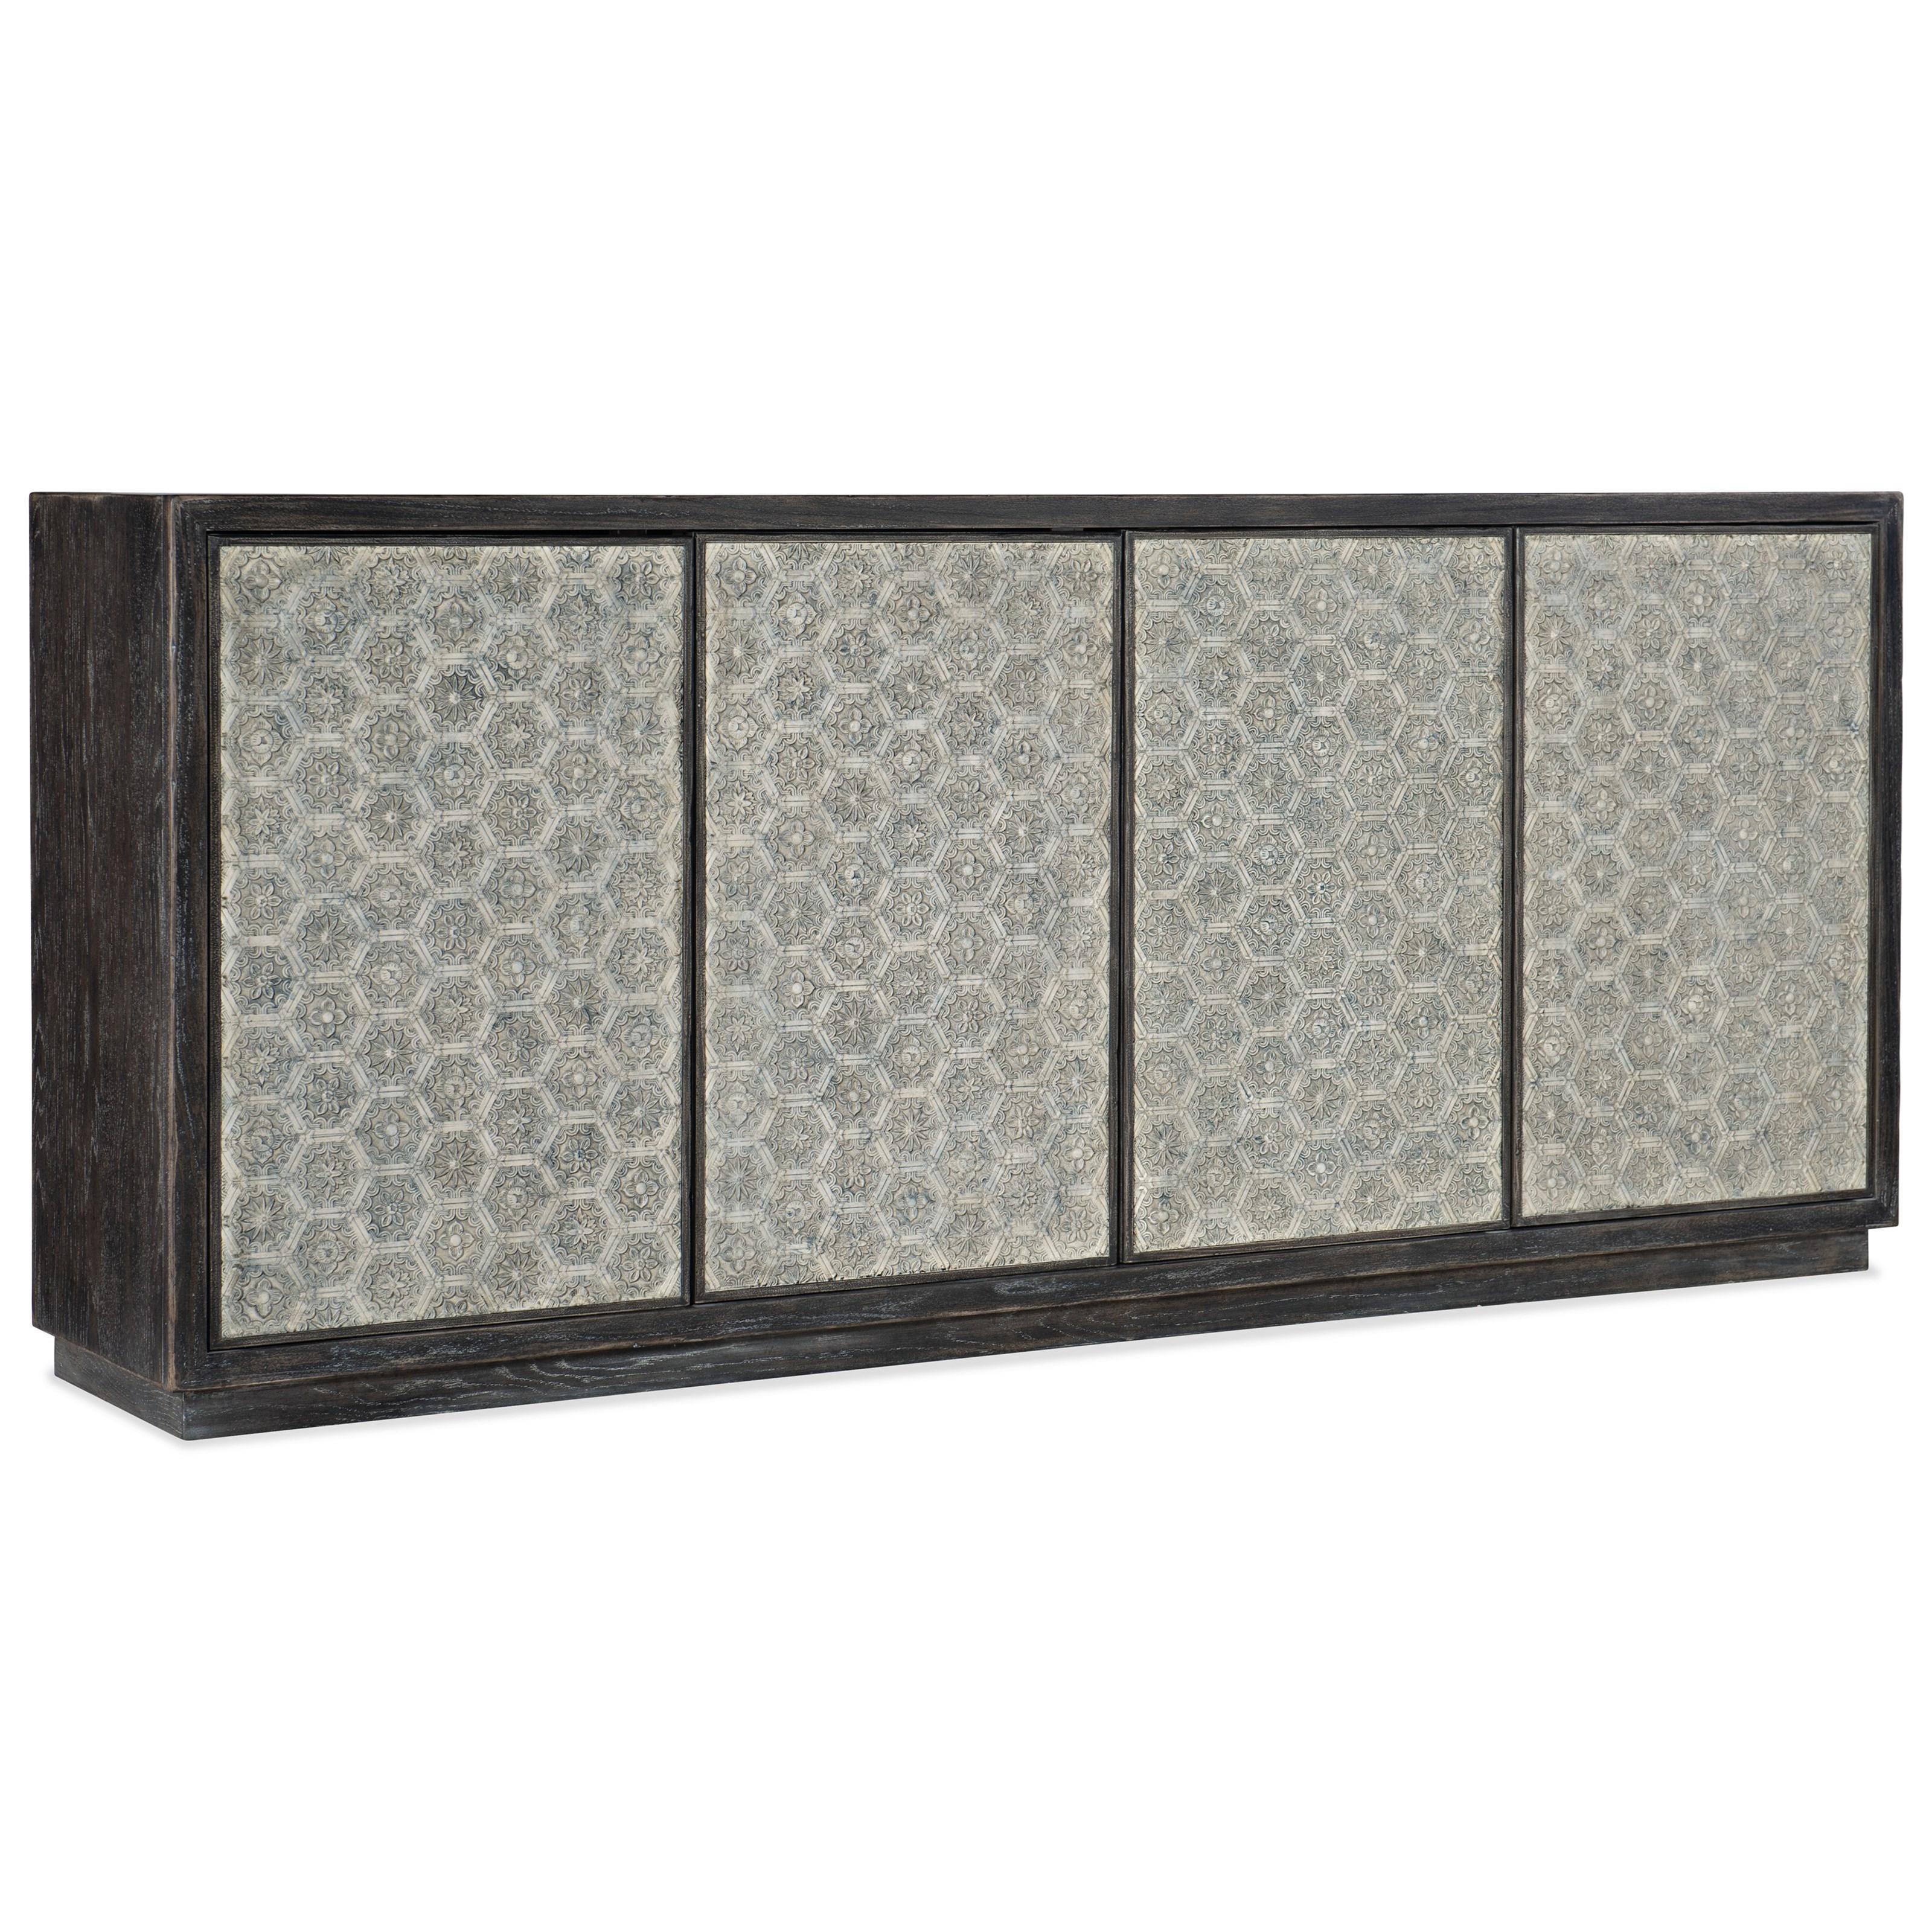 Melange Greystone Four-Door Credenza by Hooker Furniture at Stoney Creek Furniture